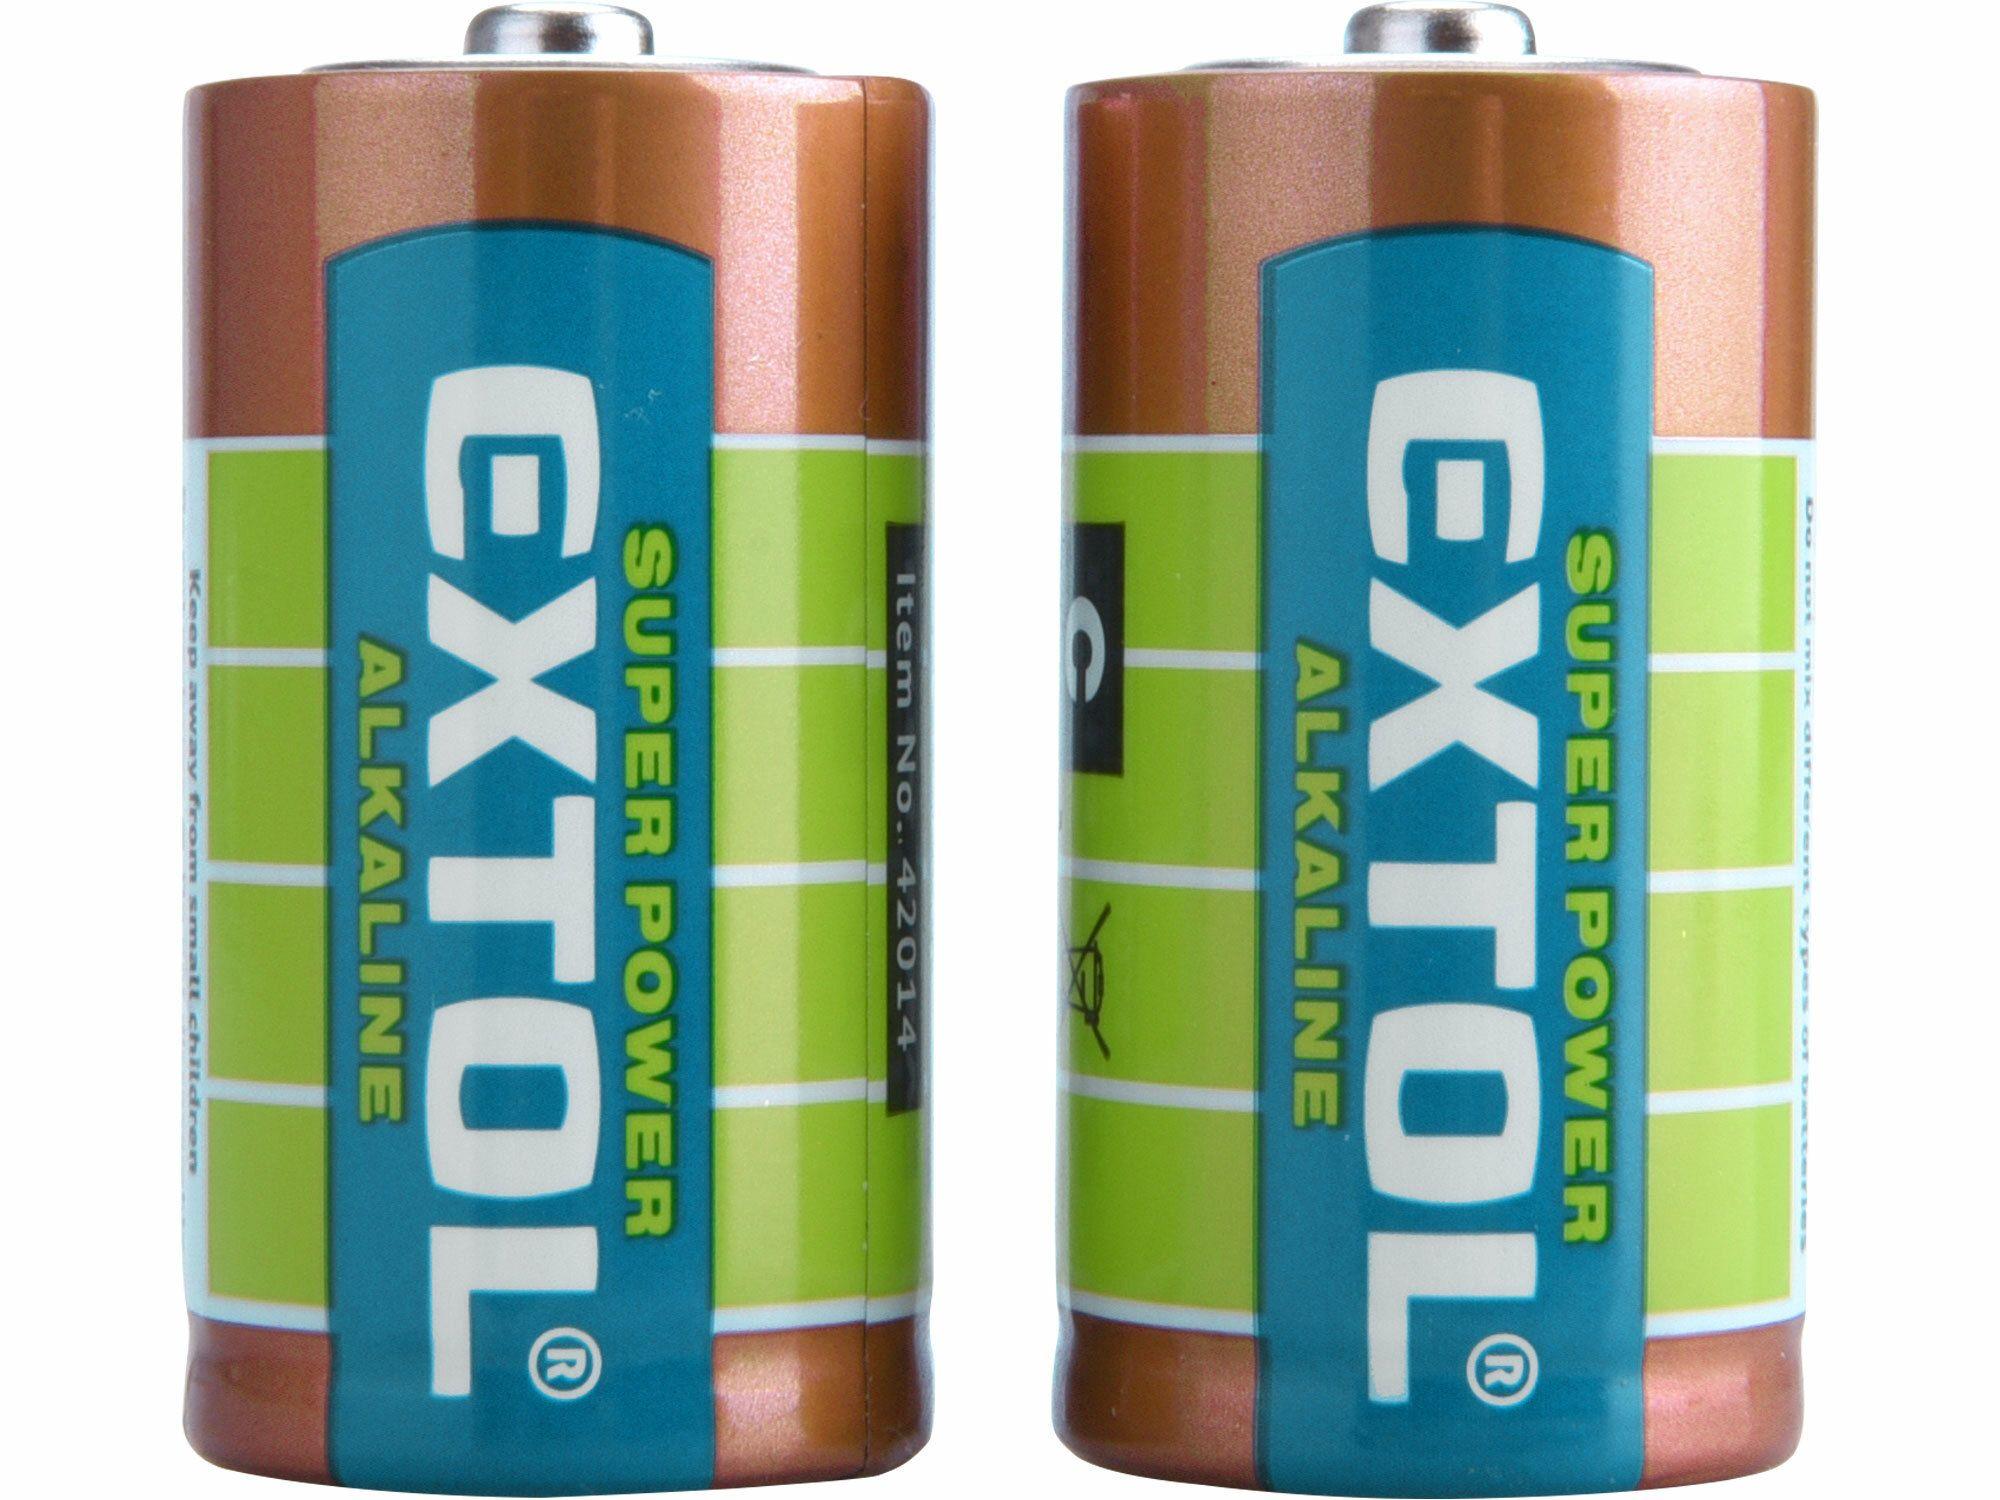 Baterie alkalické, 2ks, 1,5V C (LR14) EXTOL-LIGHT